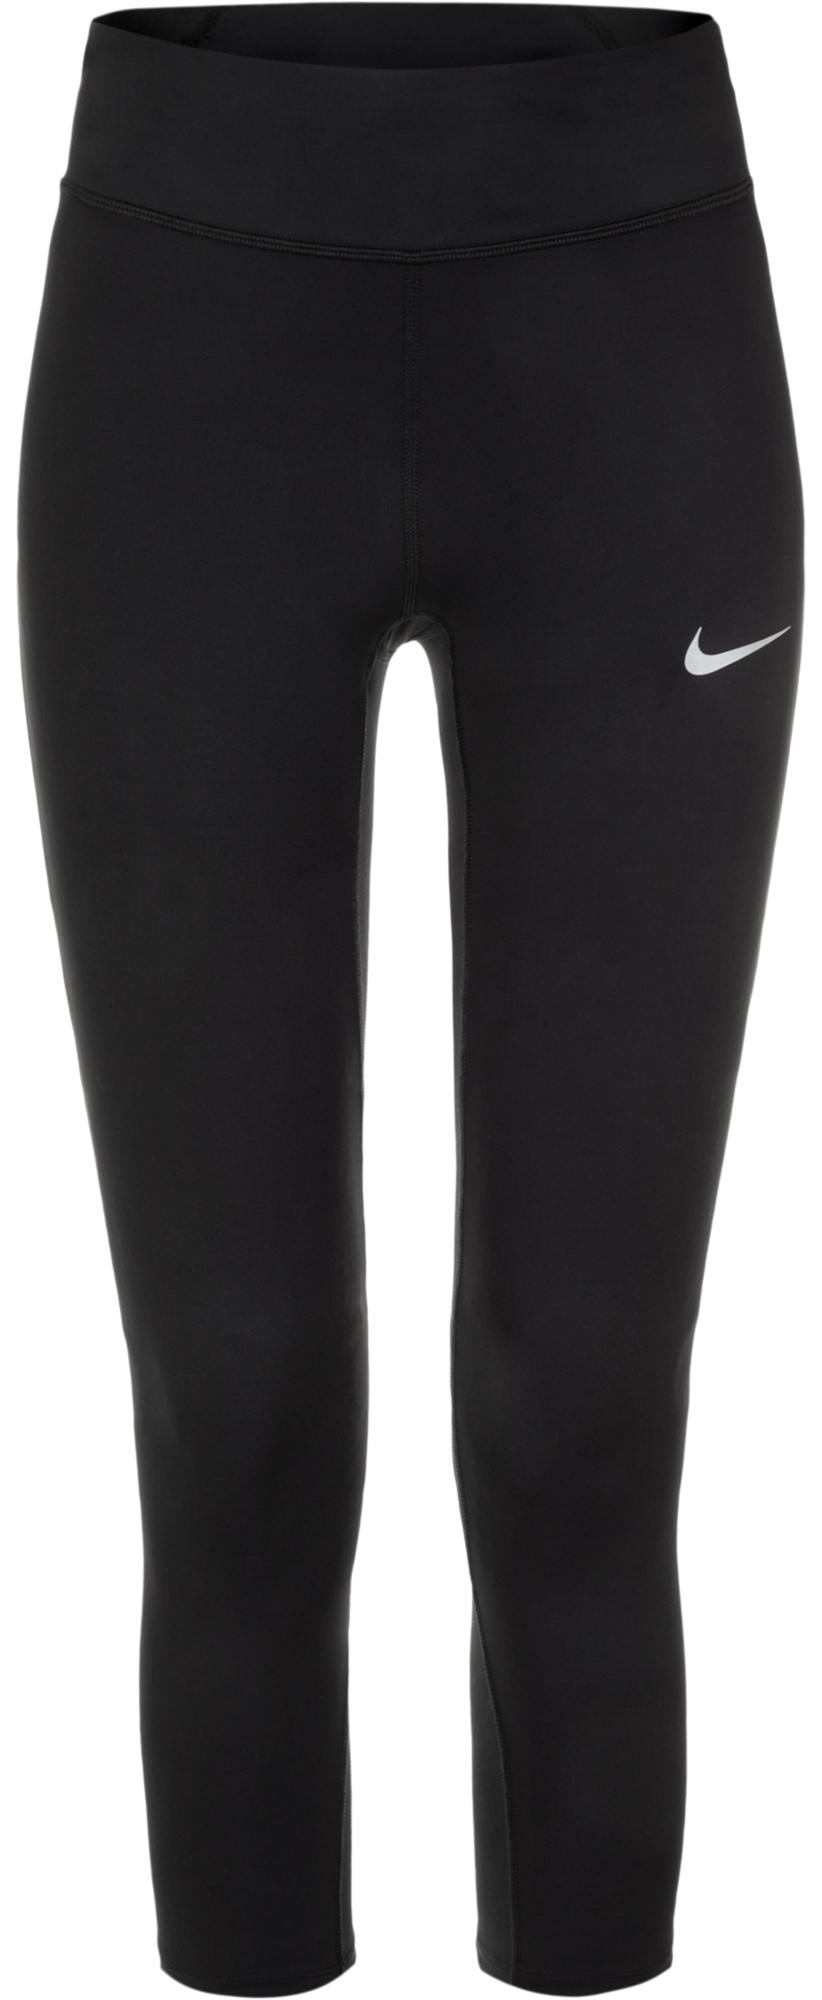 Nike Бриджи женские Nike Power Epic Lux, размер 42-44